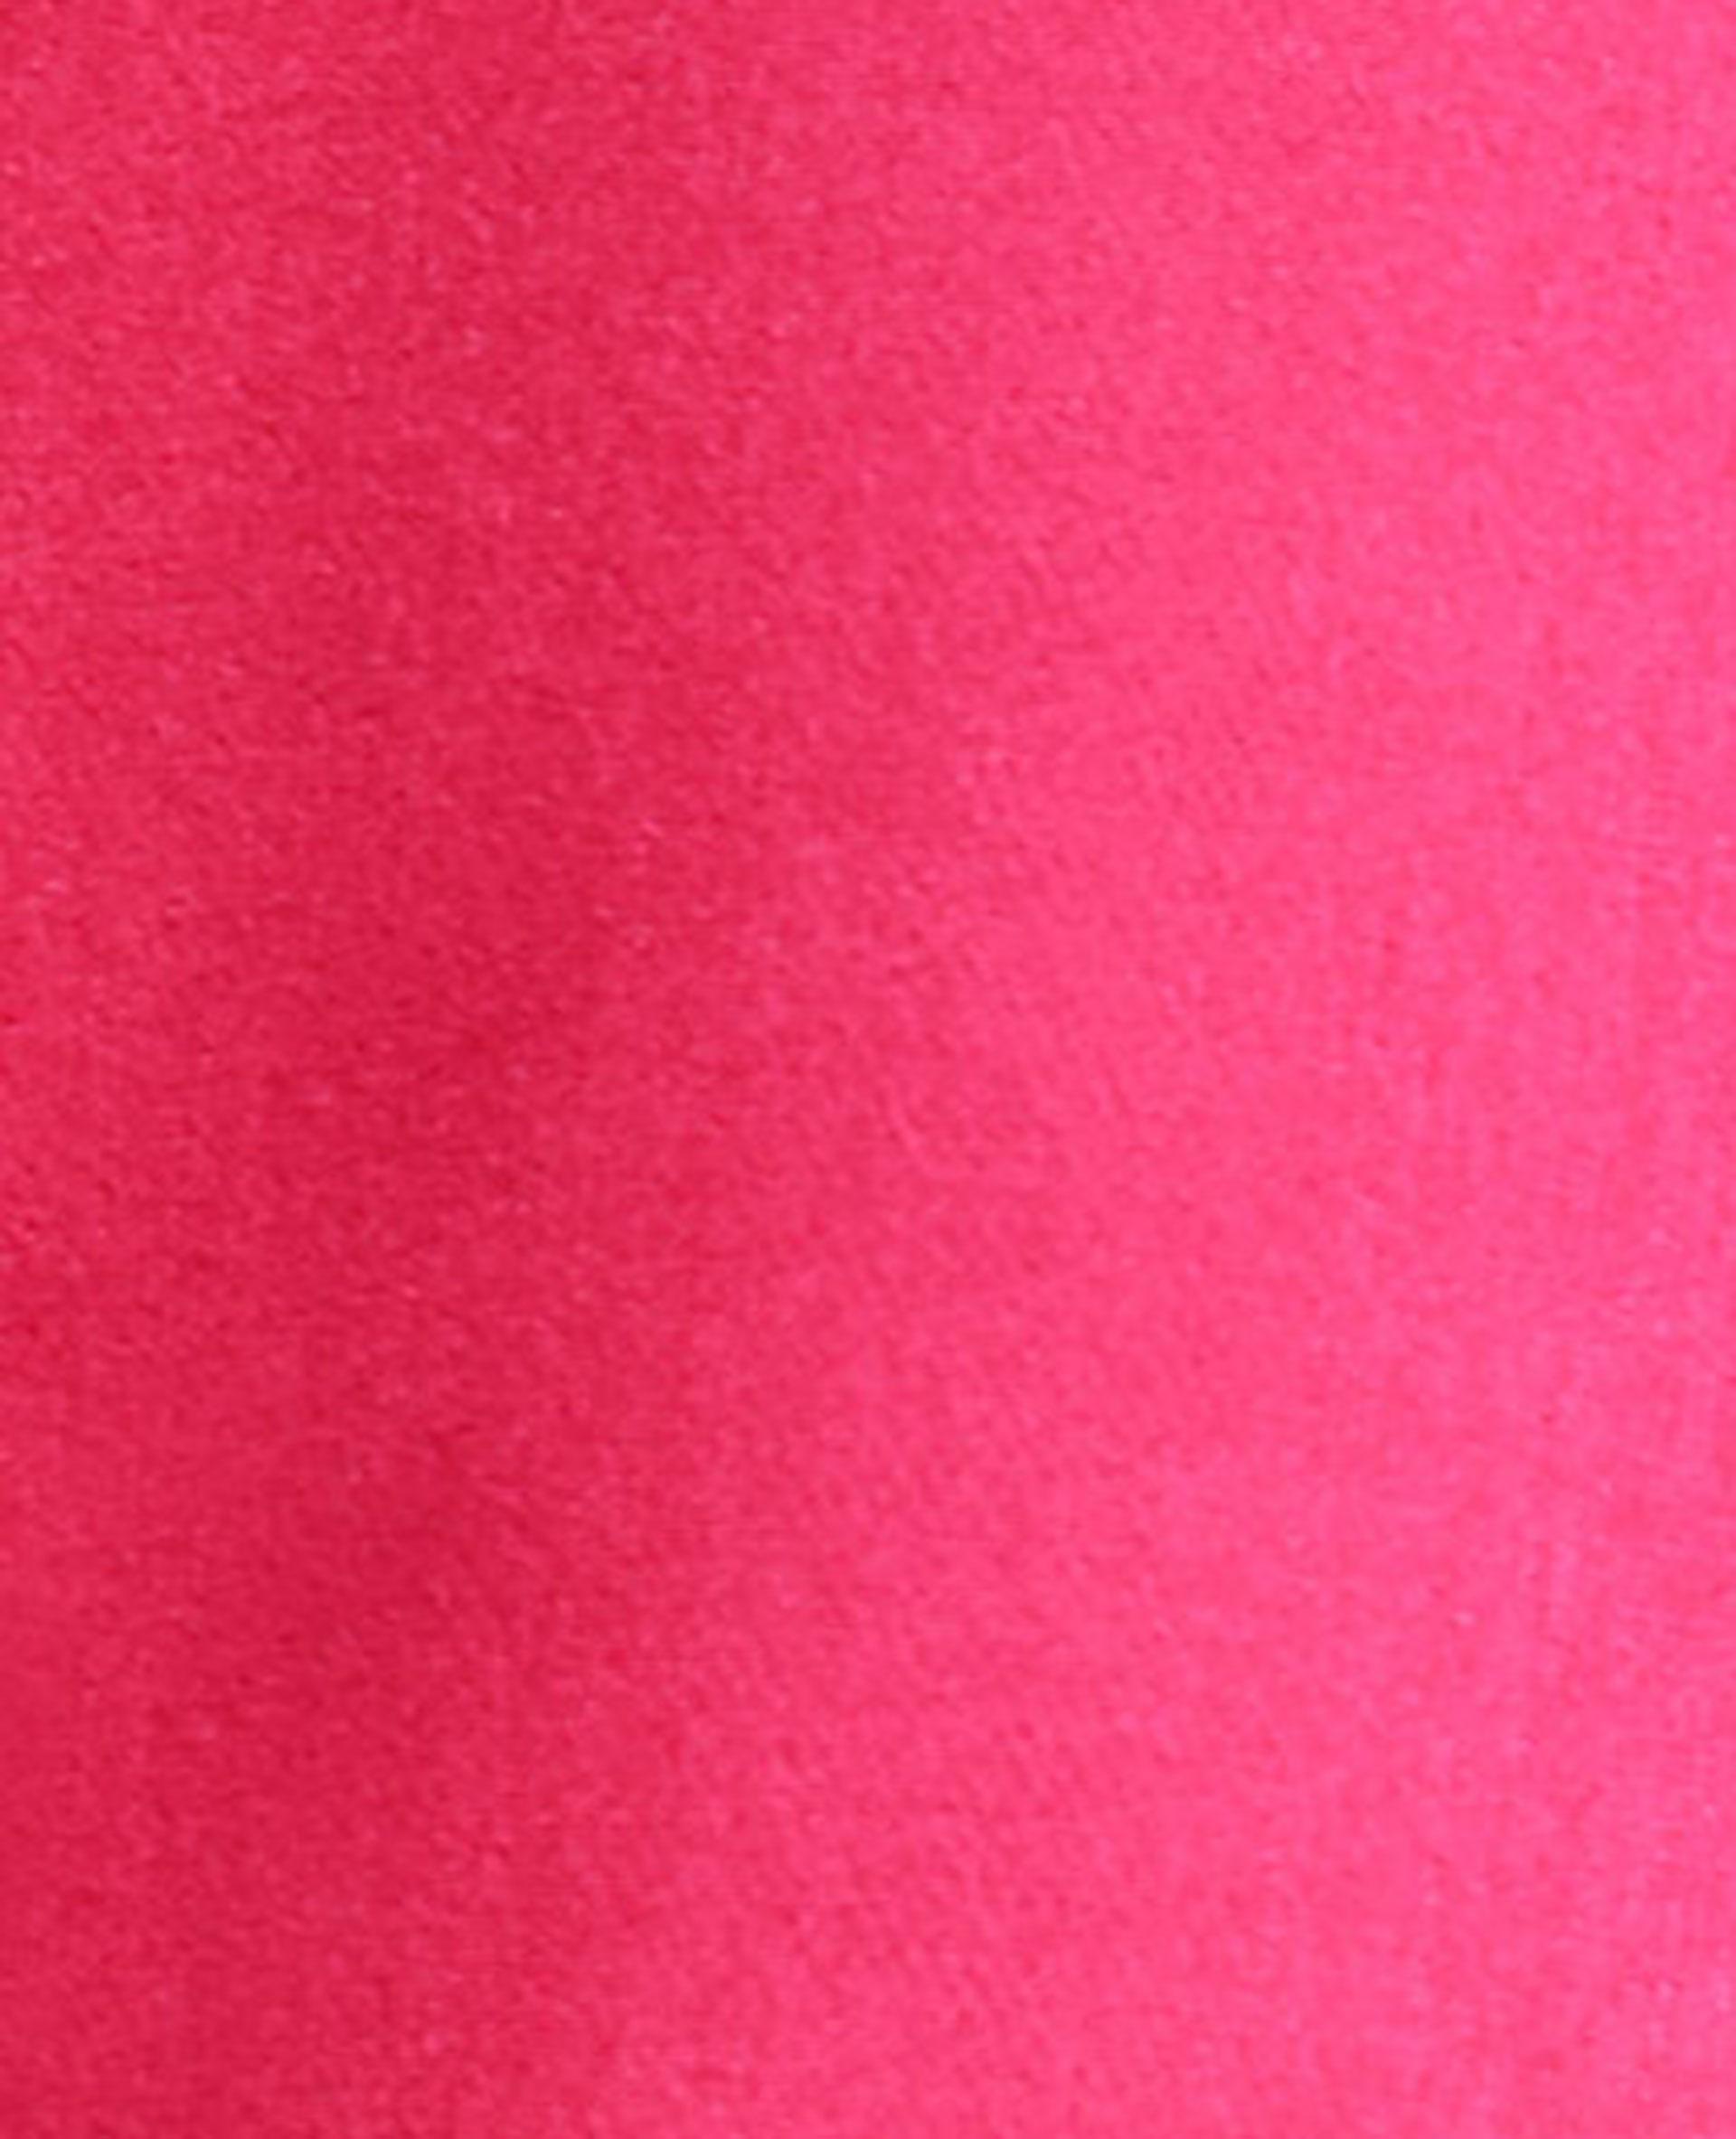 Jupe Stéphanie Durant x Pimkie rose - Pimkie